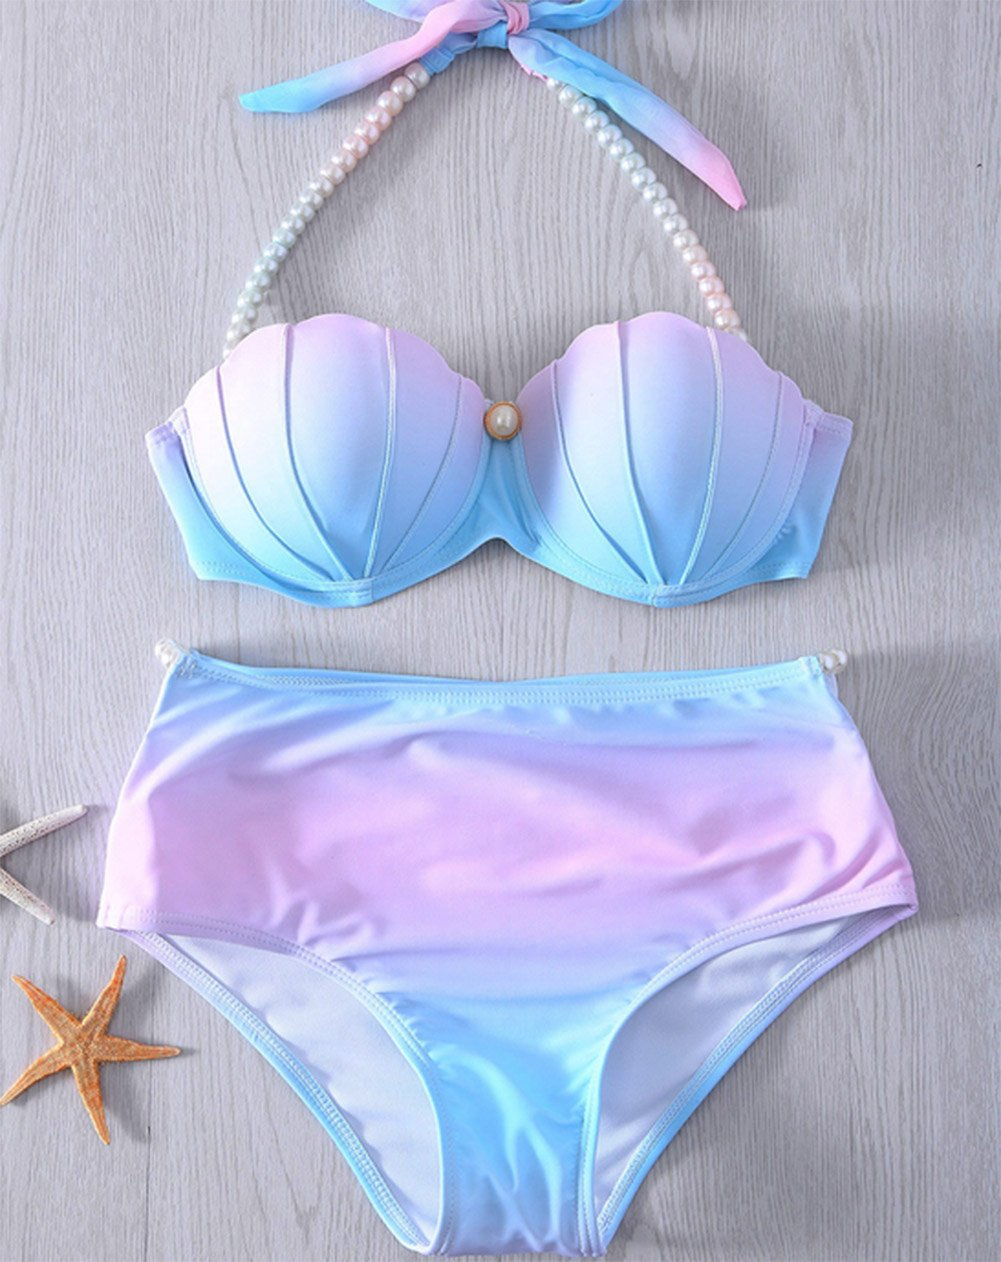 60e419056c31a YAOYUE-US Womens Mermaid Shell Bikini Sets Pearl Strap Halter Padded  Push-up Swimsuit Beachwear (Tag M/US4-6, Light Blue) < Sets < Clothing,  Shoes & Jewelry ...